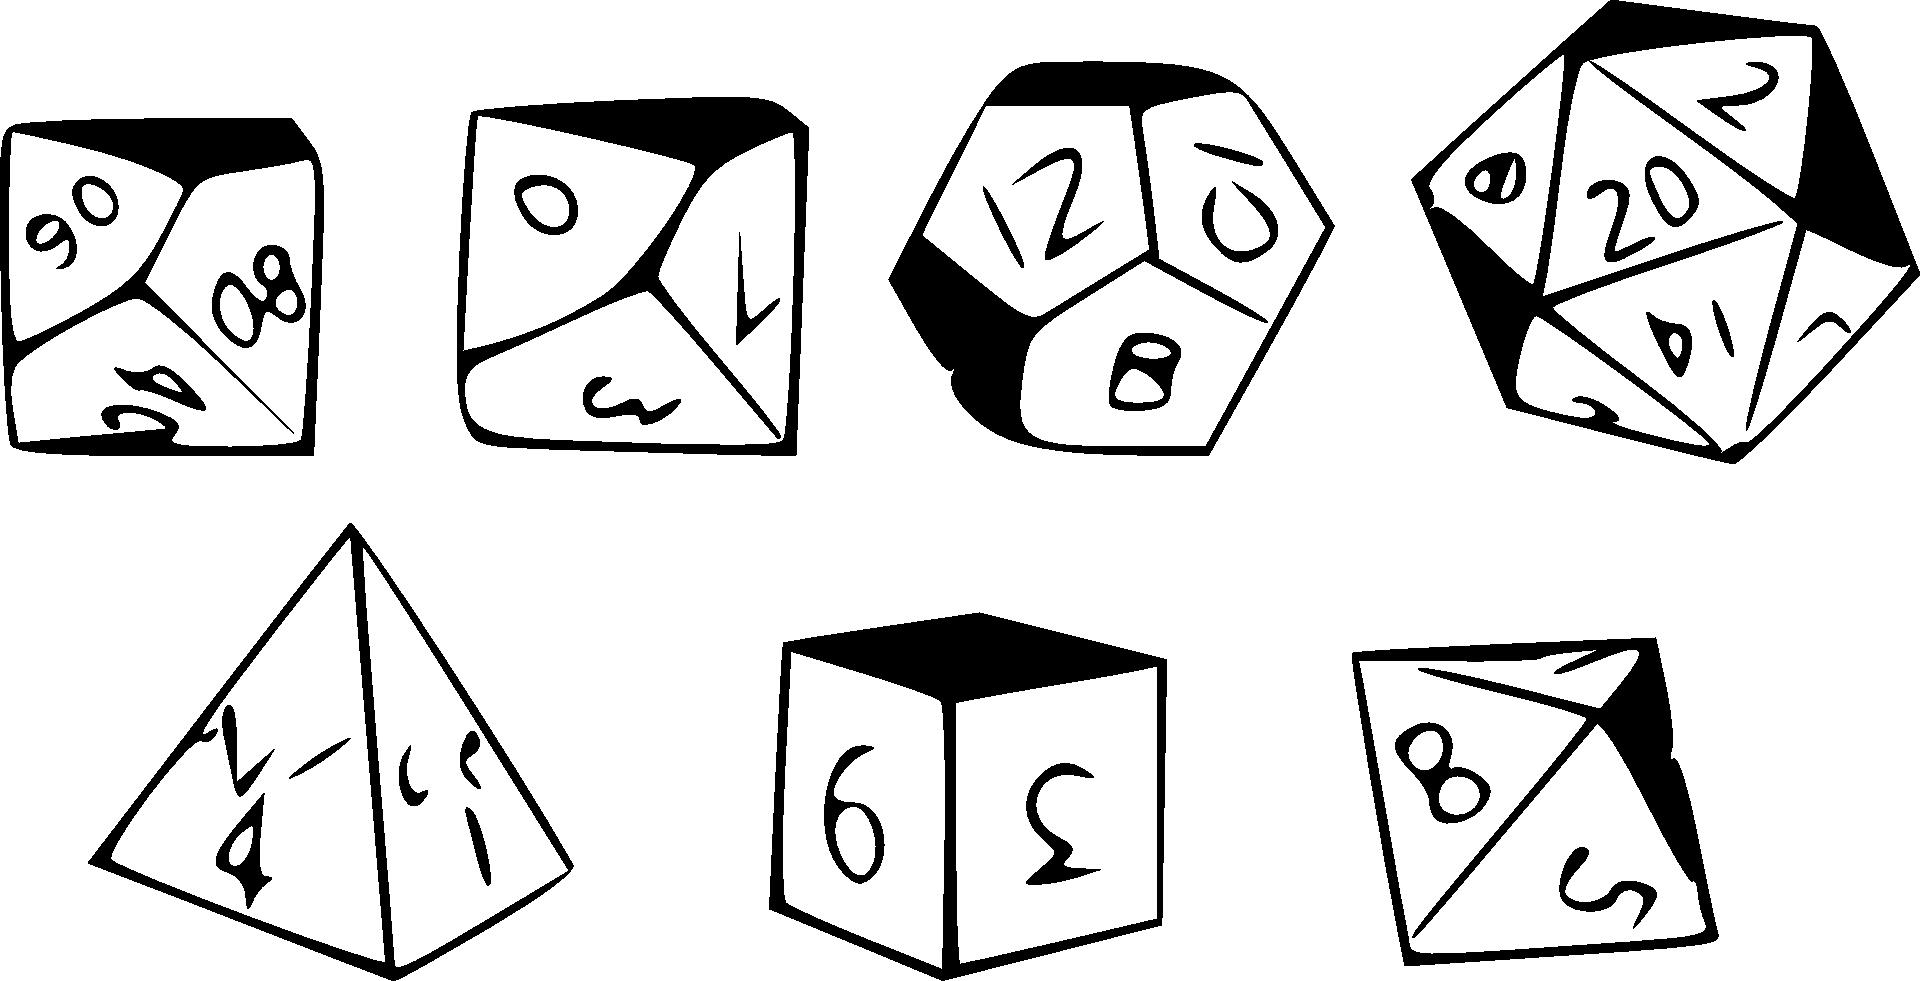 dice-160388.png